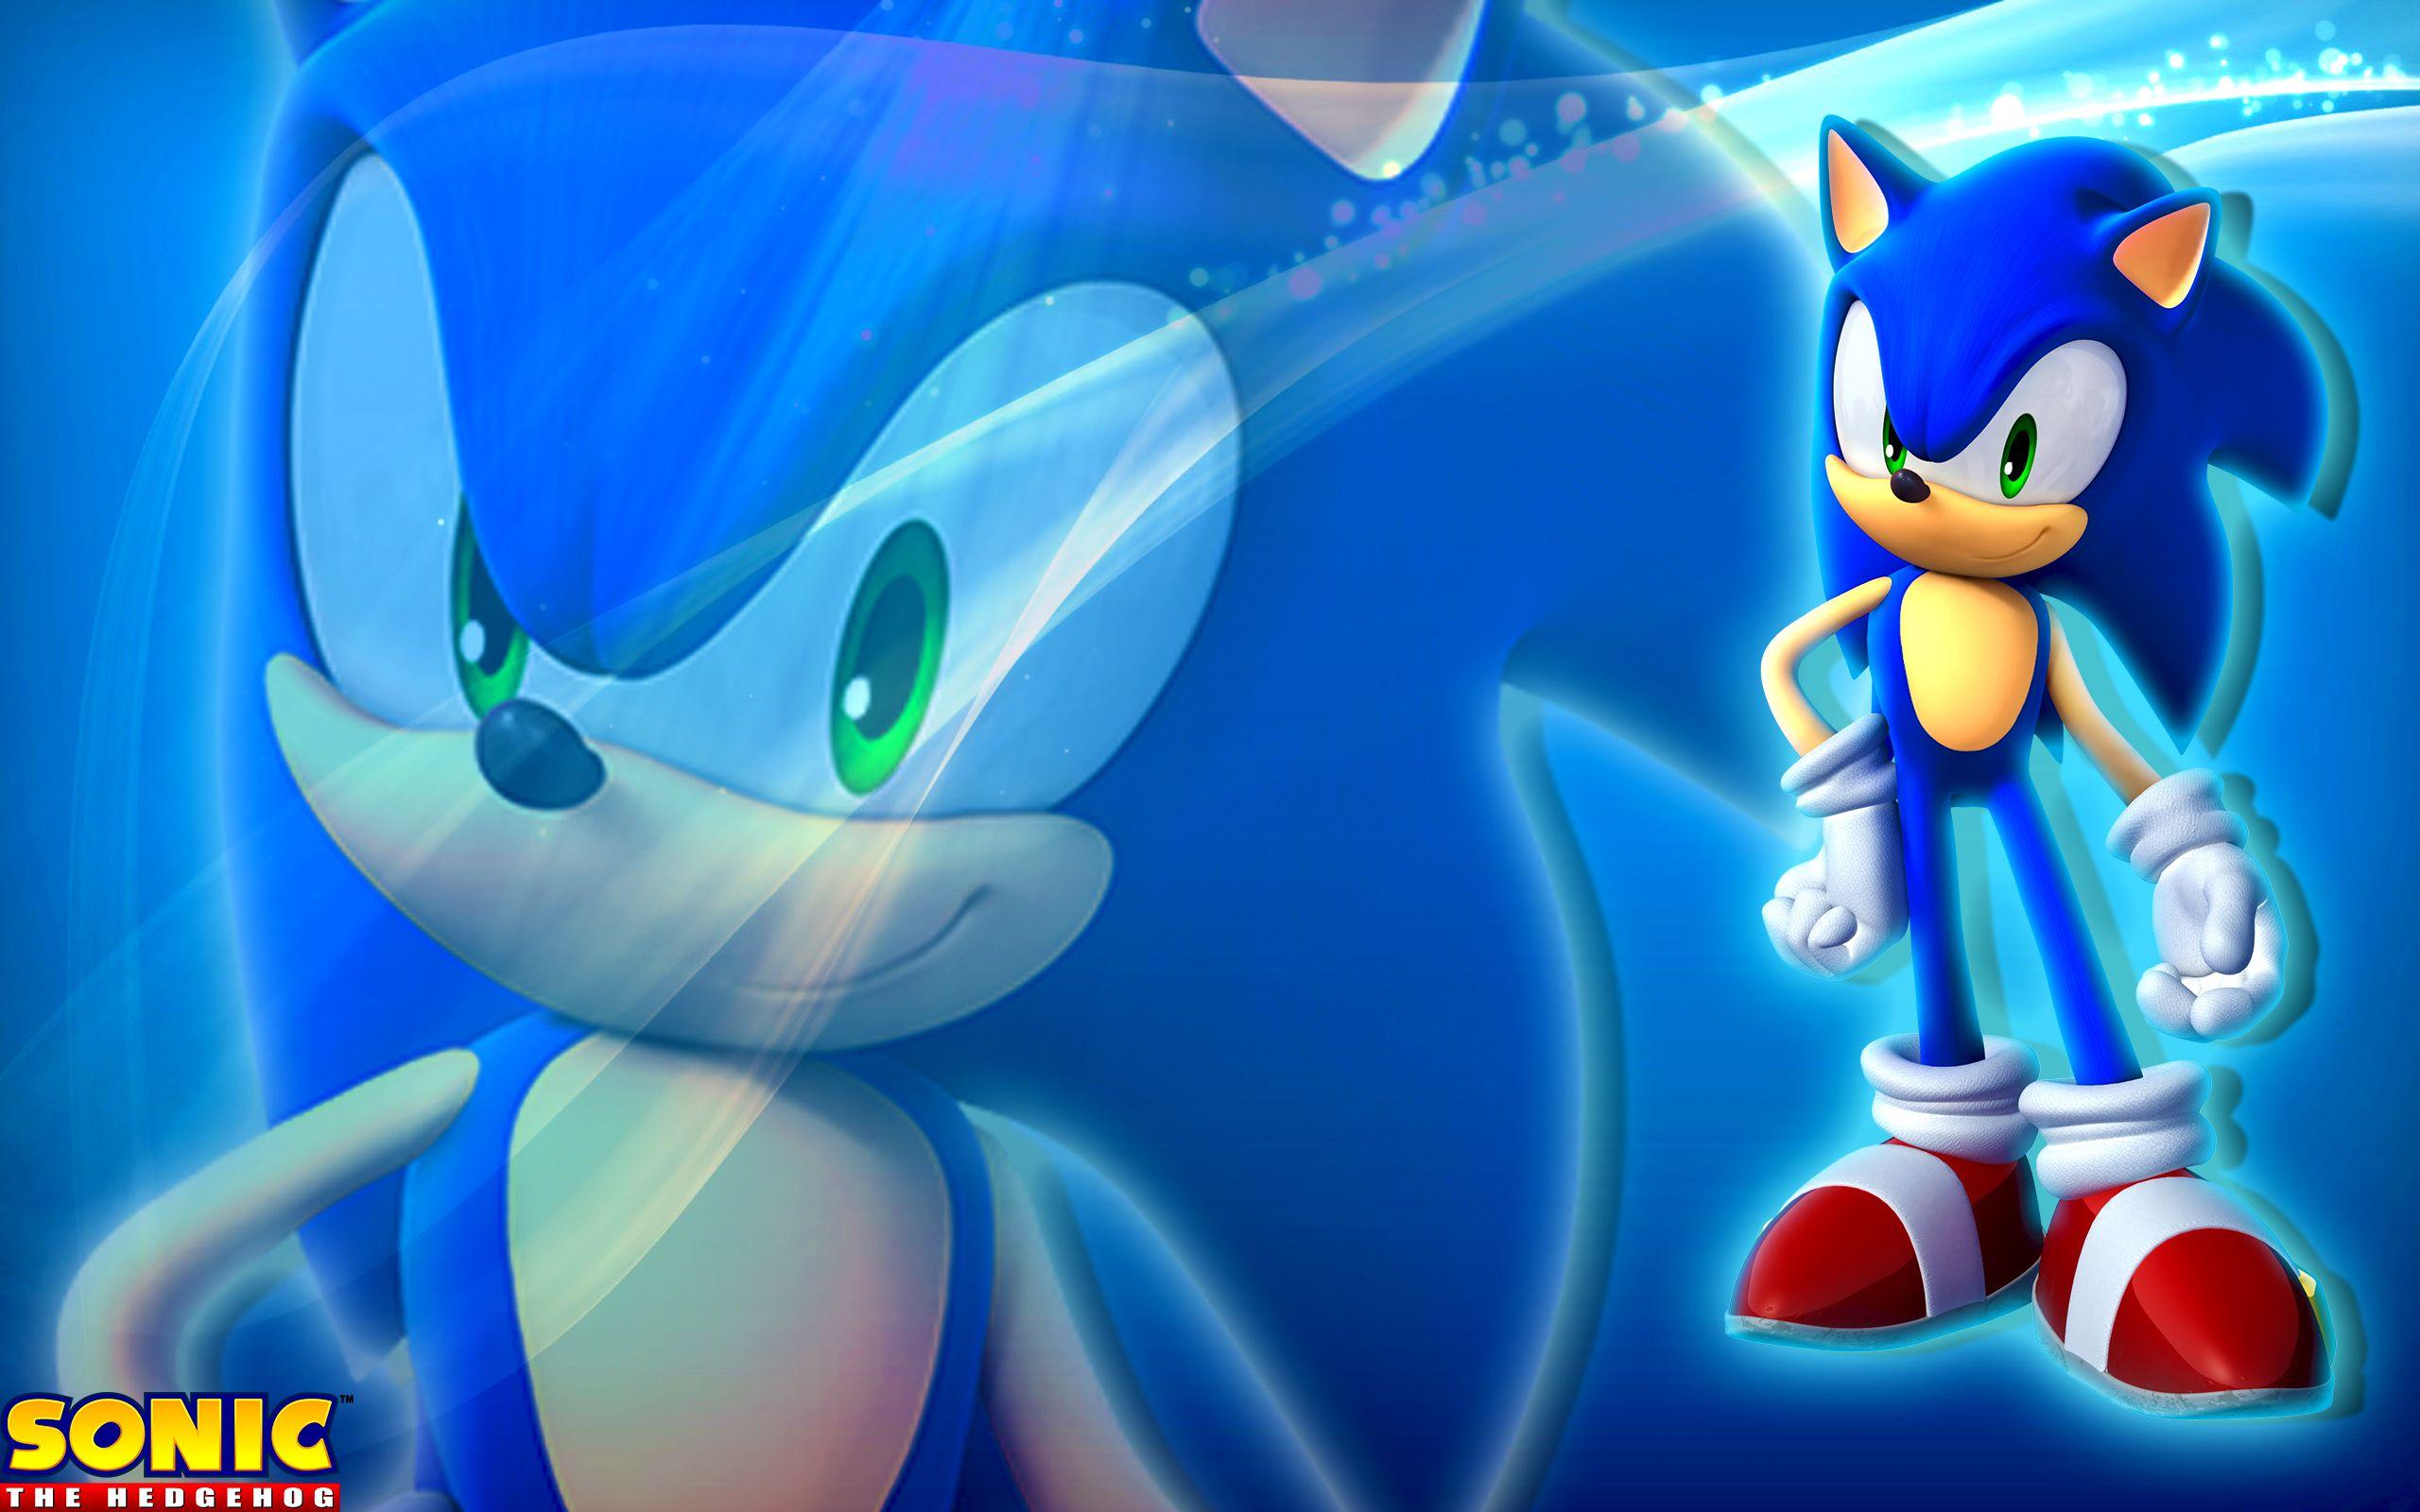 Sonic The Hedgehog Wallpaper By Sonicthehedgehogbg On Deviantart Cartoon Wallpaper Sonic Hedgehog